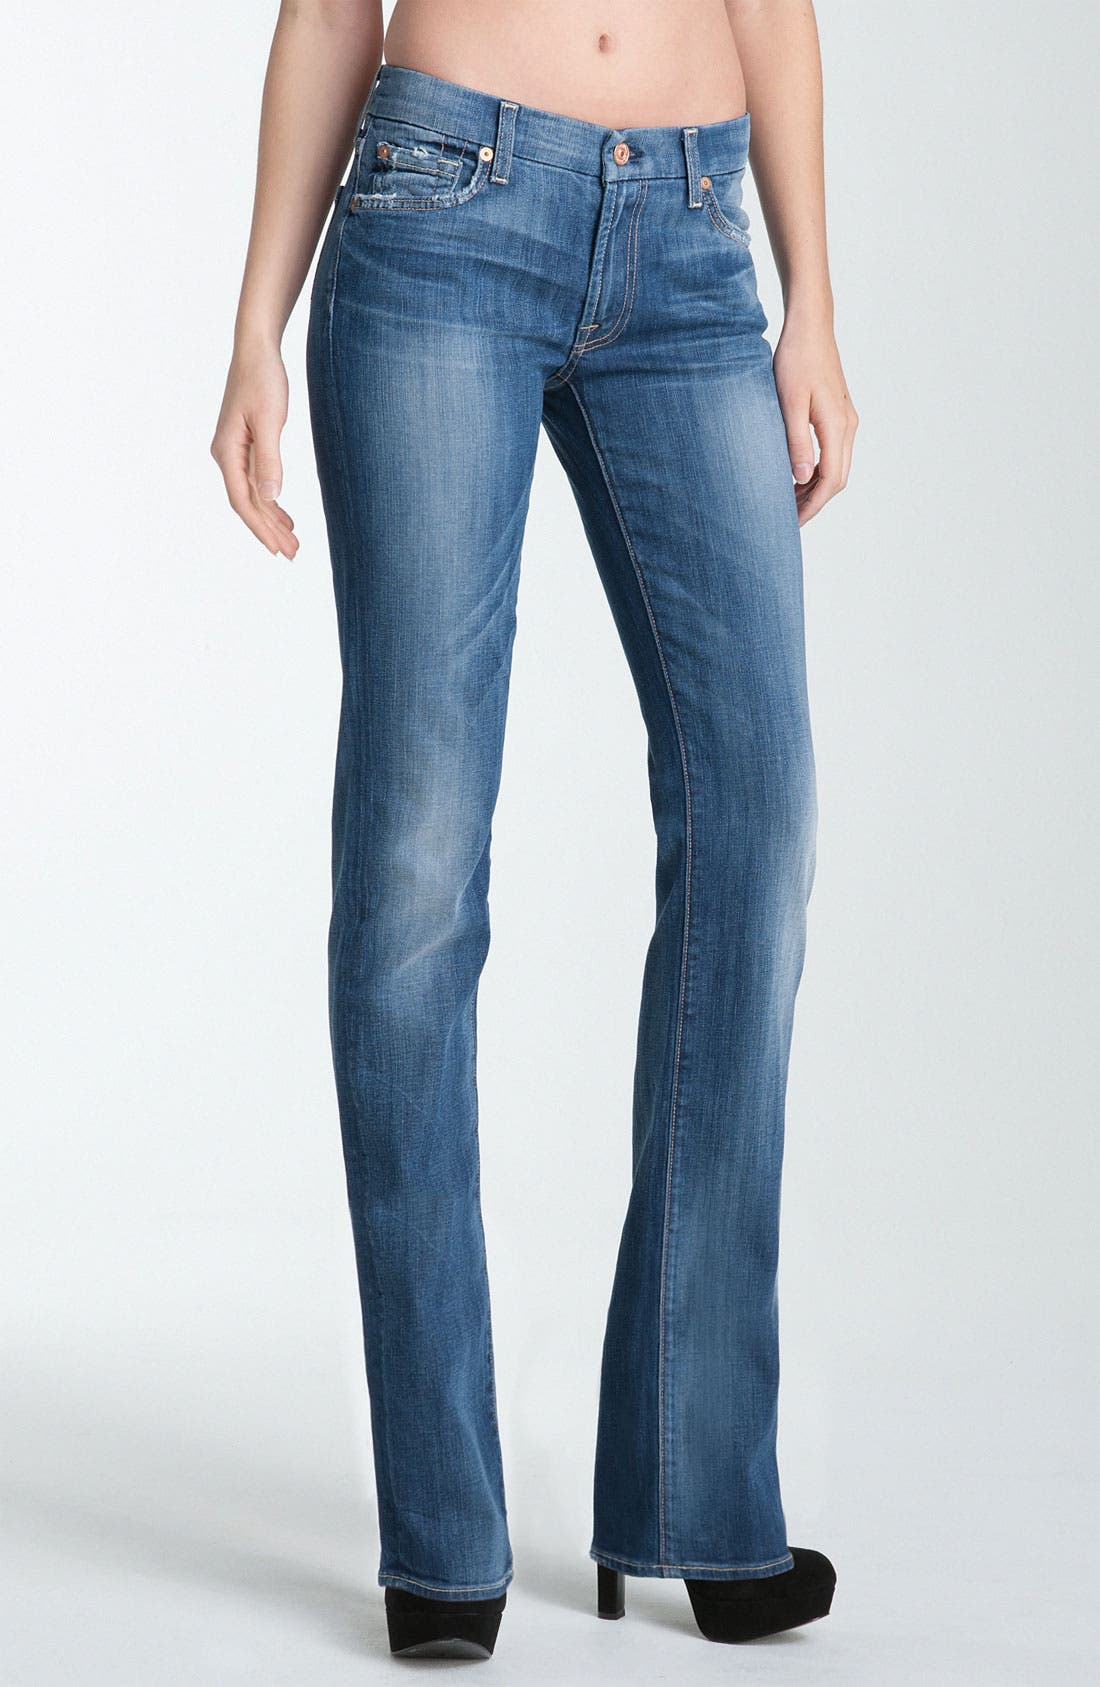 Main Image - 7 For All Mankind® 'Kimmie' Straight Leg Jeans (Medium Worn)